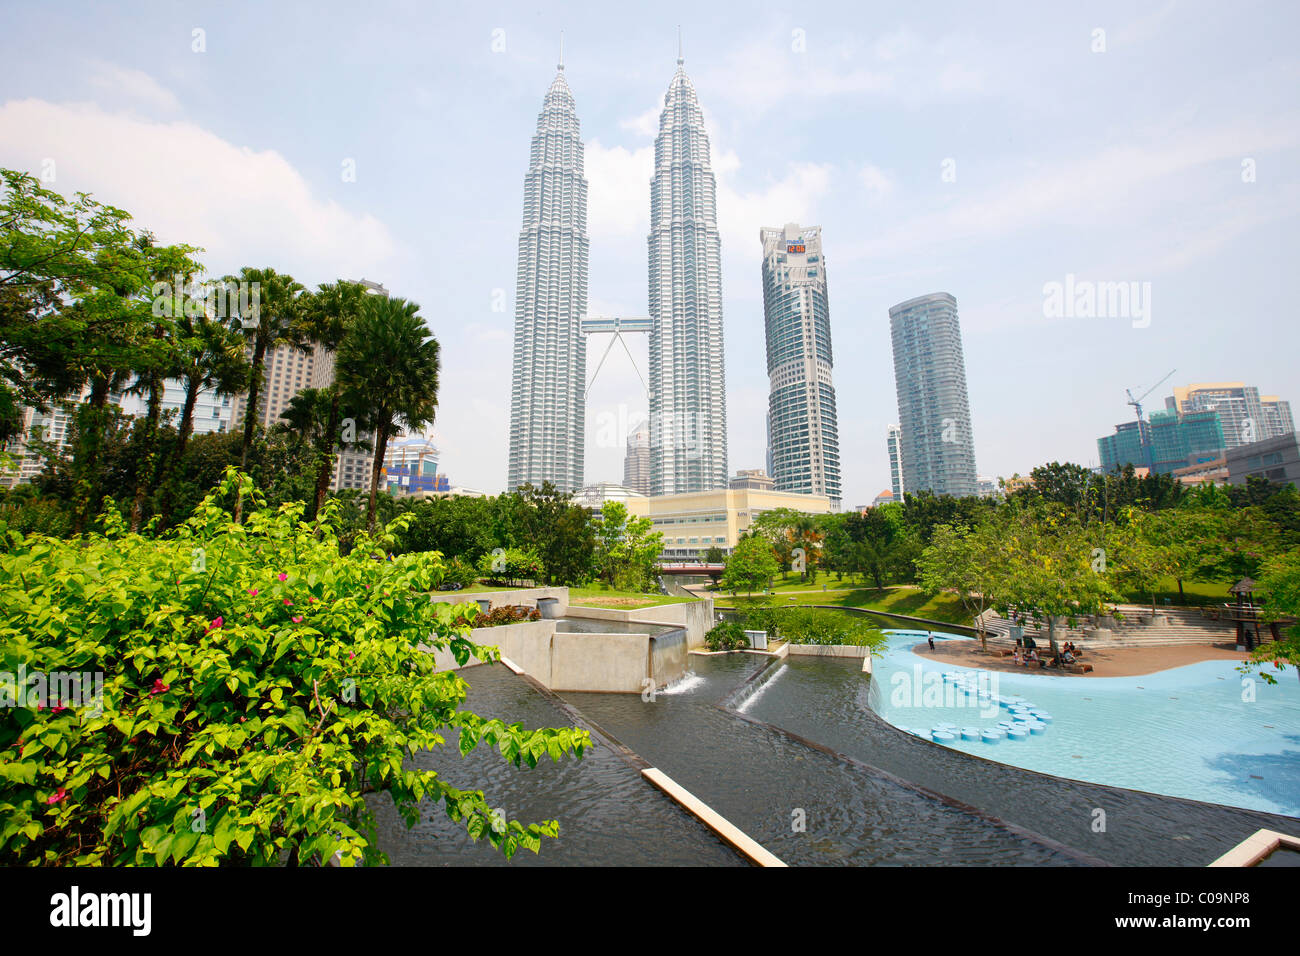 KLCC Park, Petronas Twin Towers, Kuala Lumpur, Malaysia, Asia - Stock Image